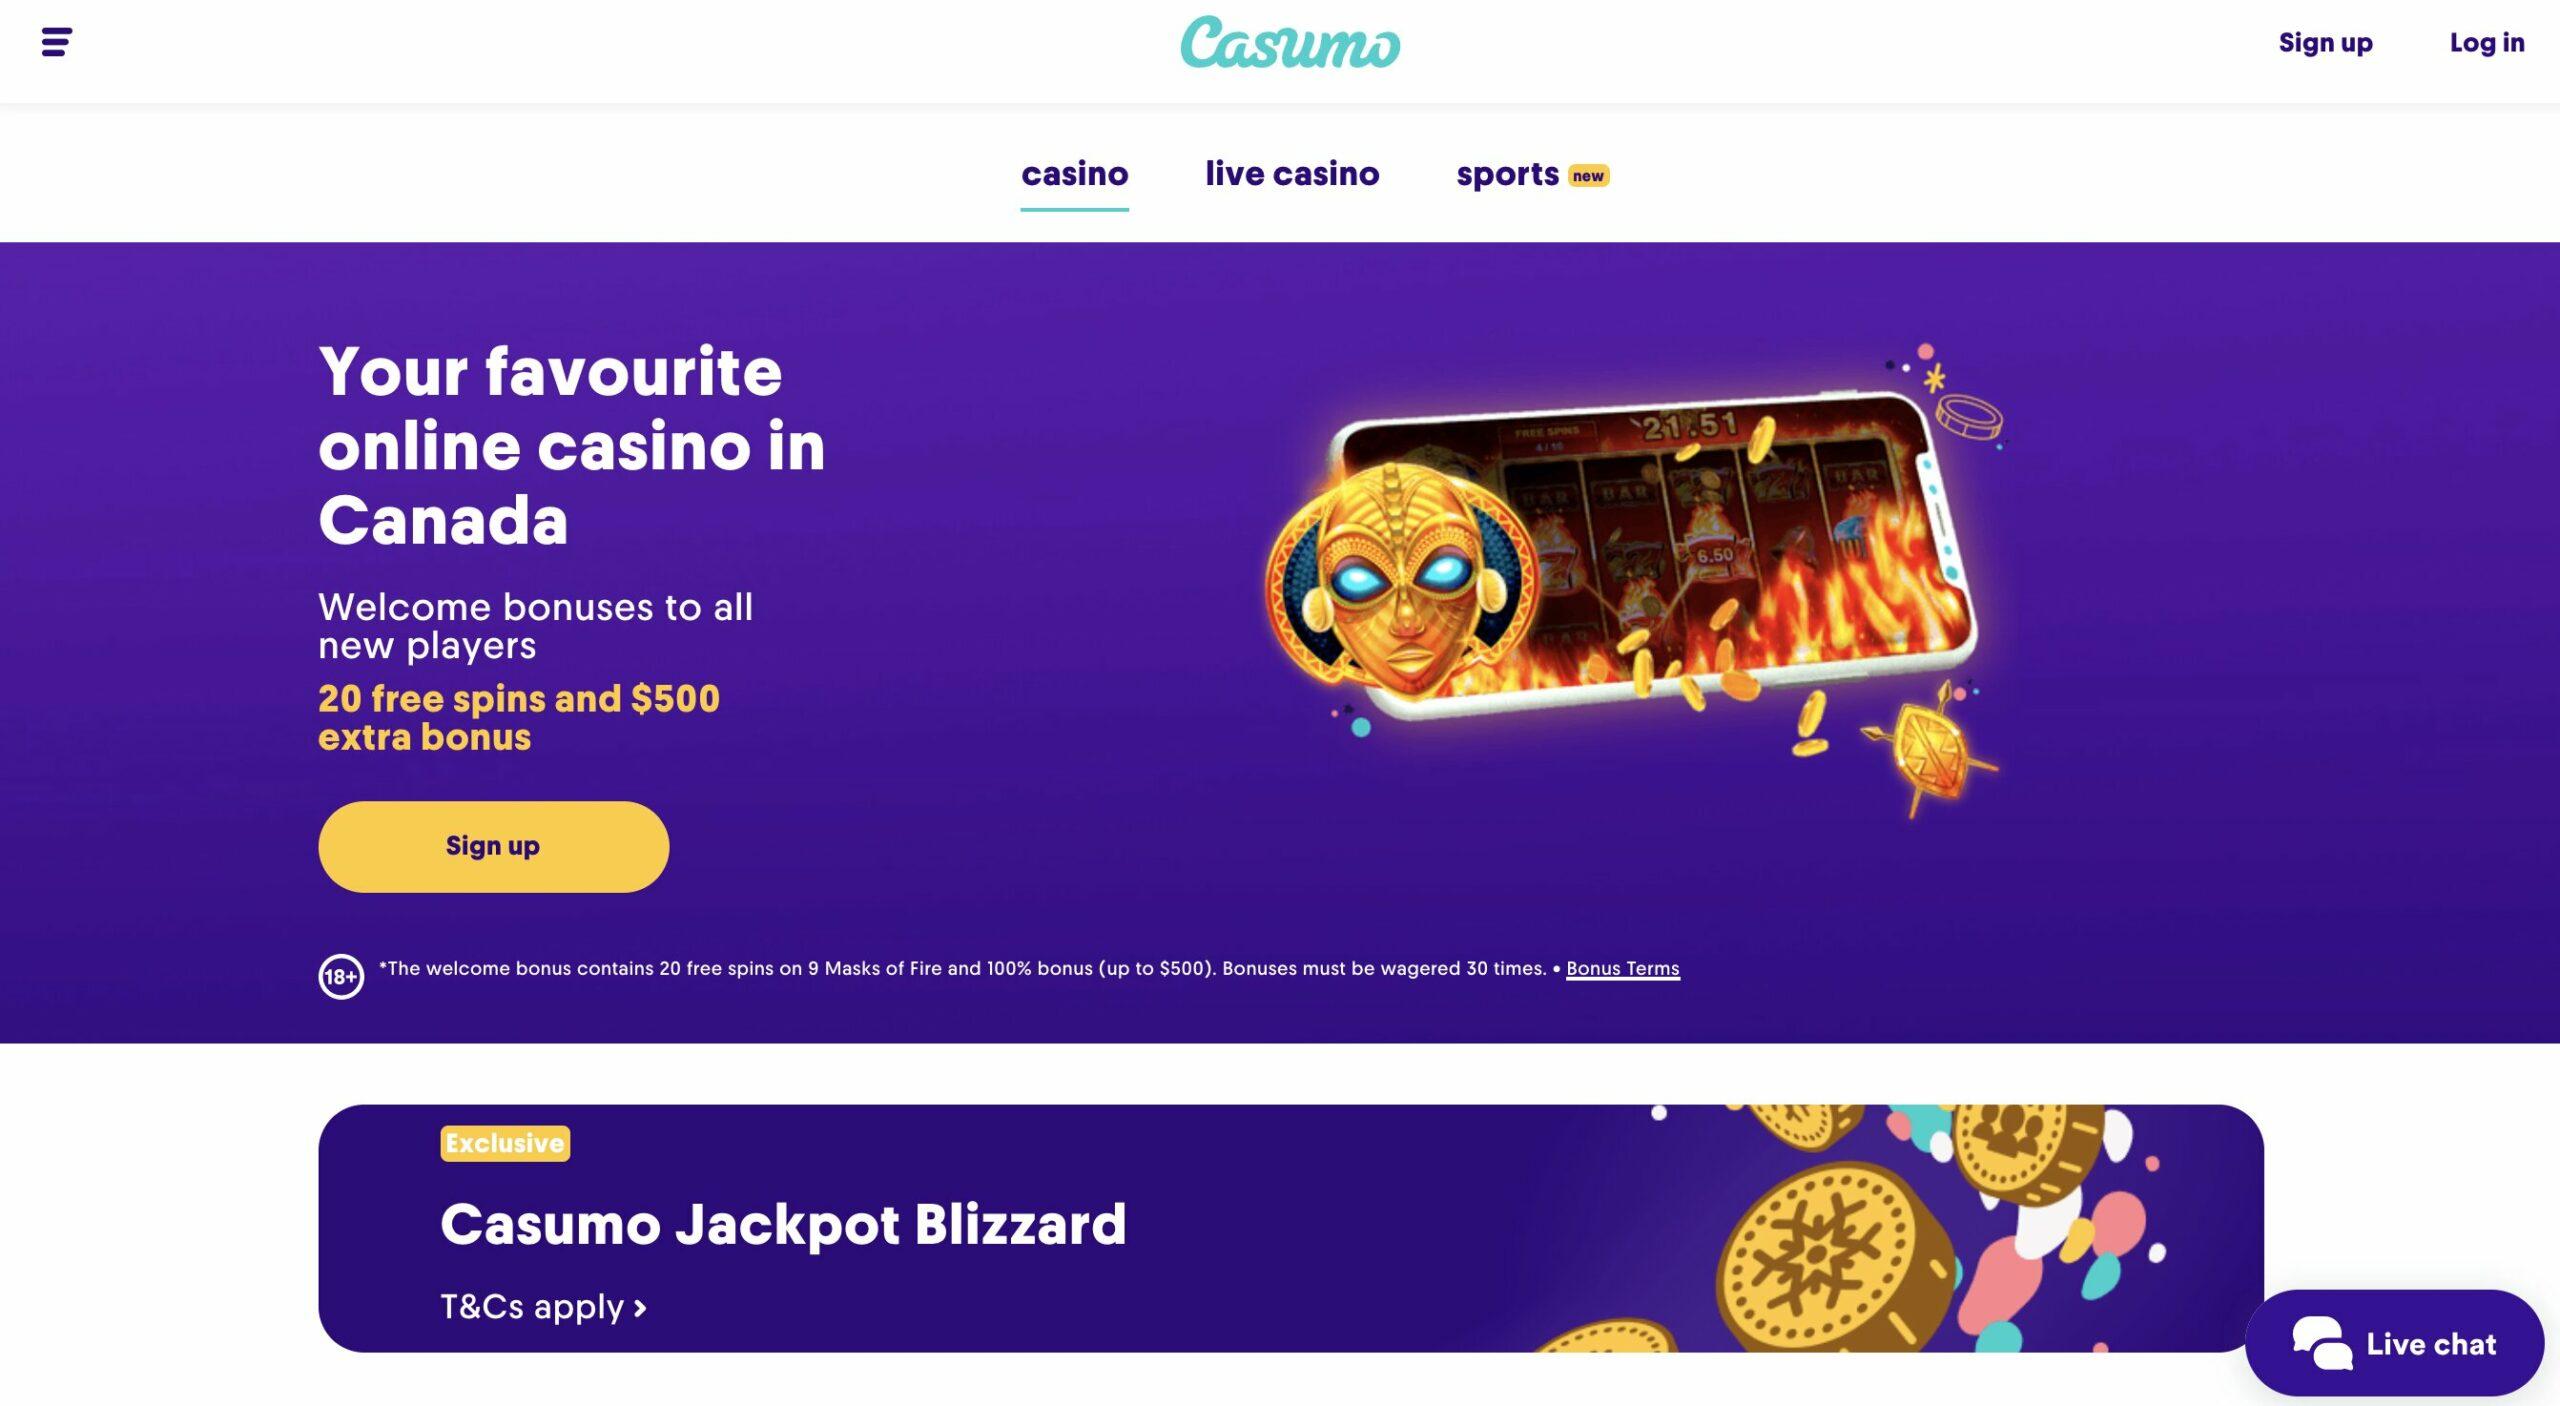 Casumo Casino Canada Online